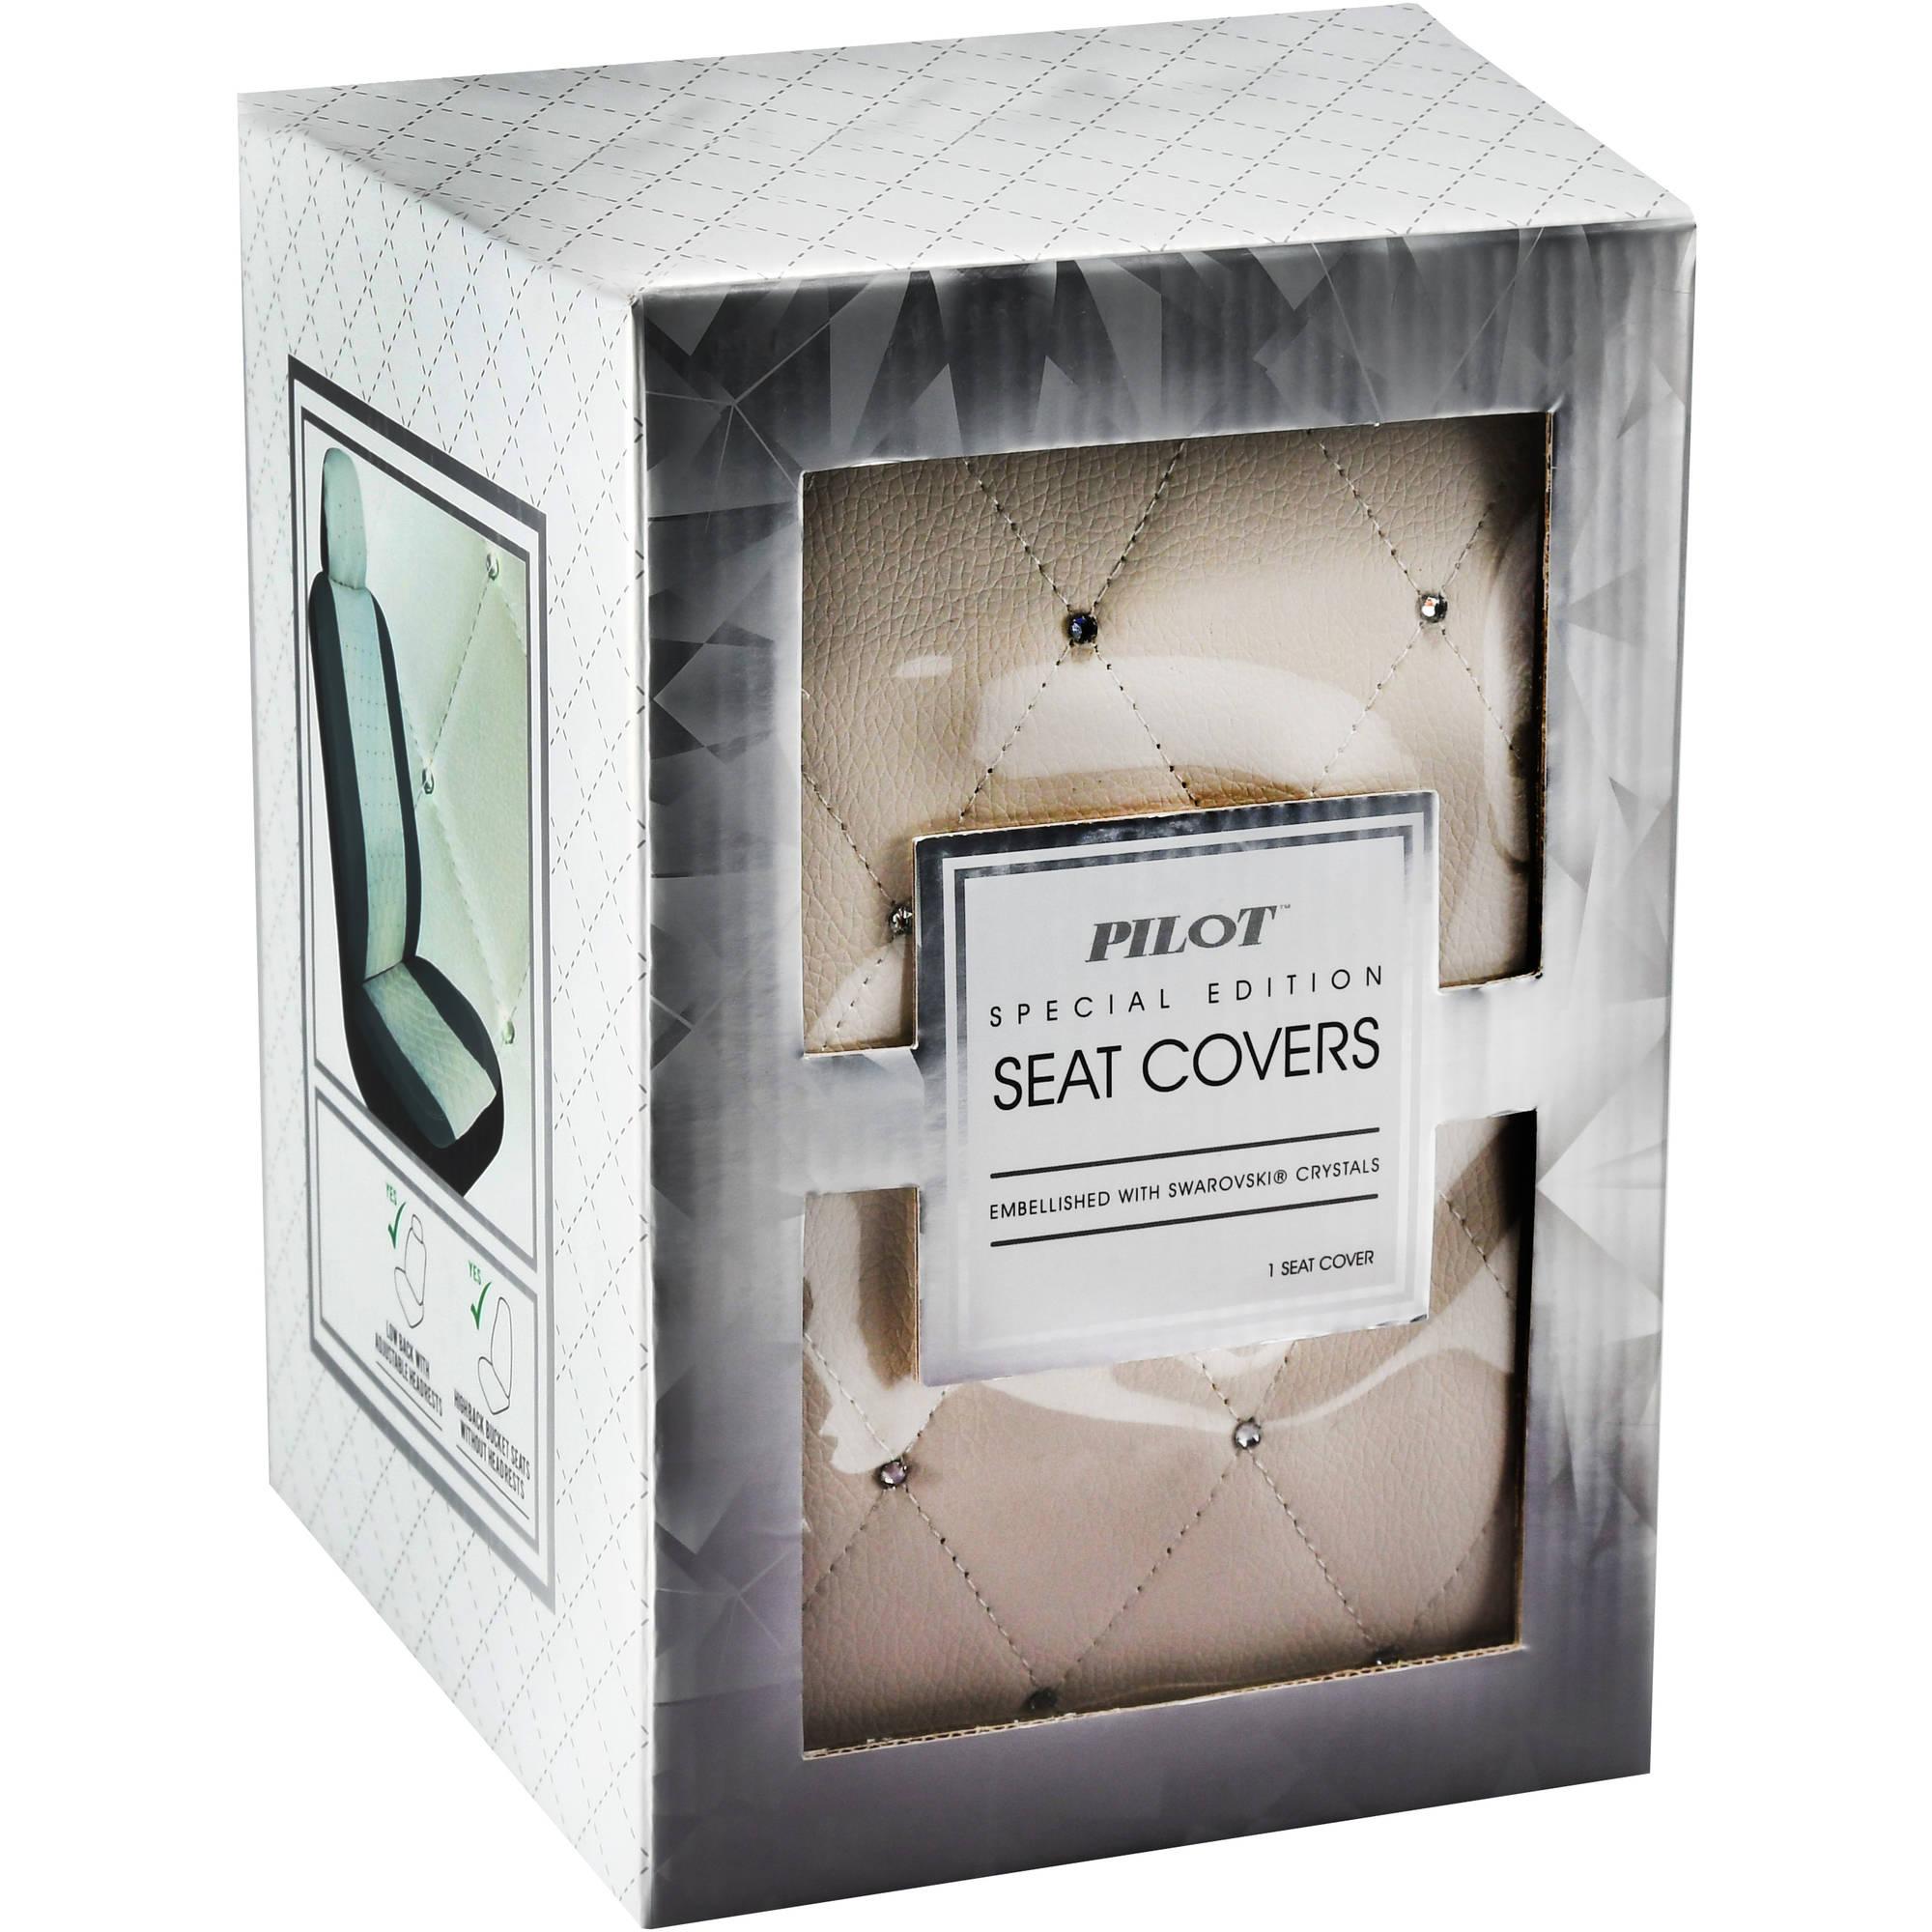 Premium Diamond Seat Cover with Crystals from Swarovski, White